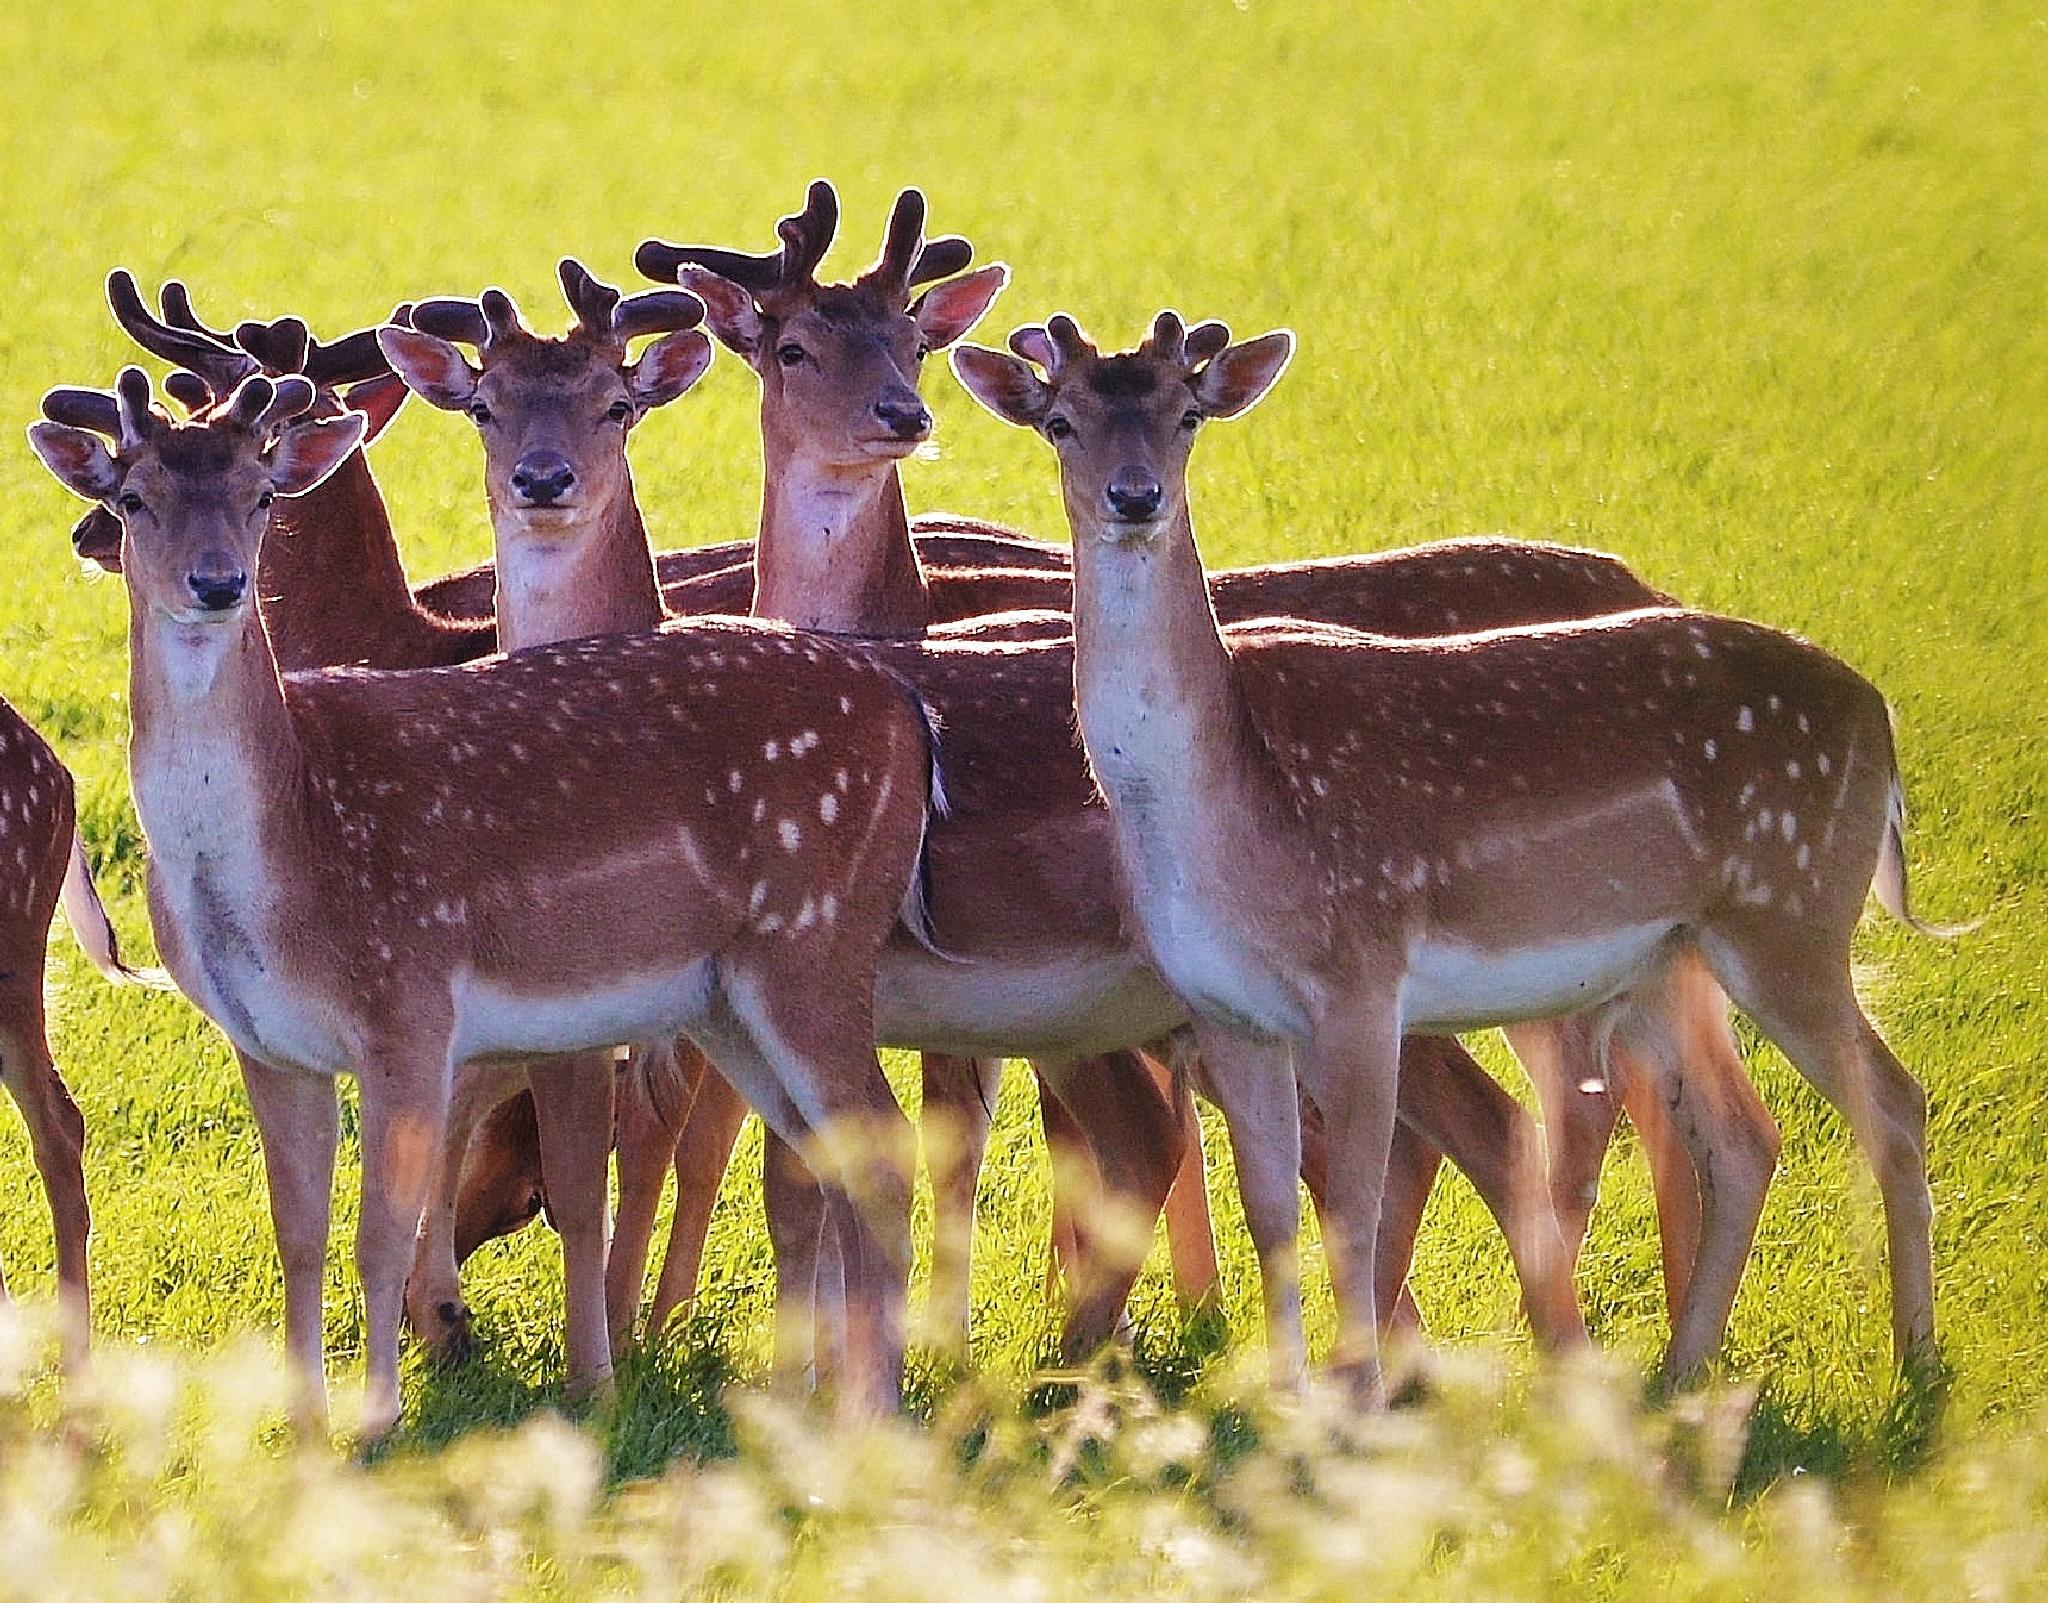 The Deer family 2. by Per Göthe